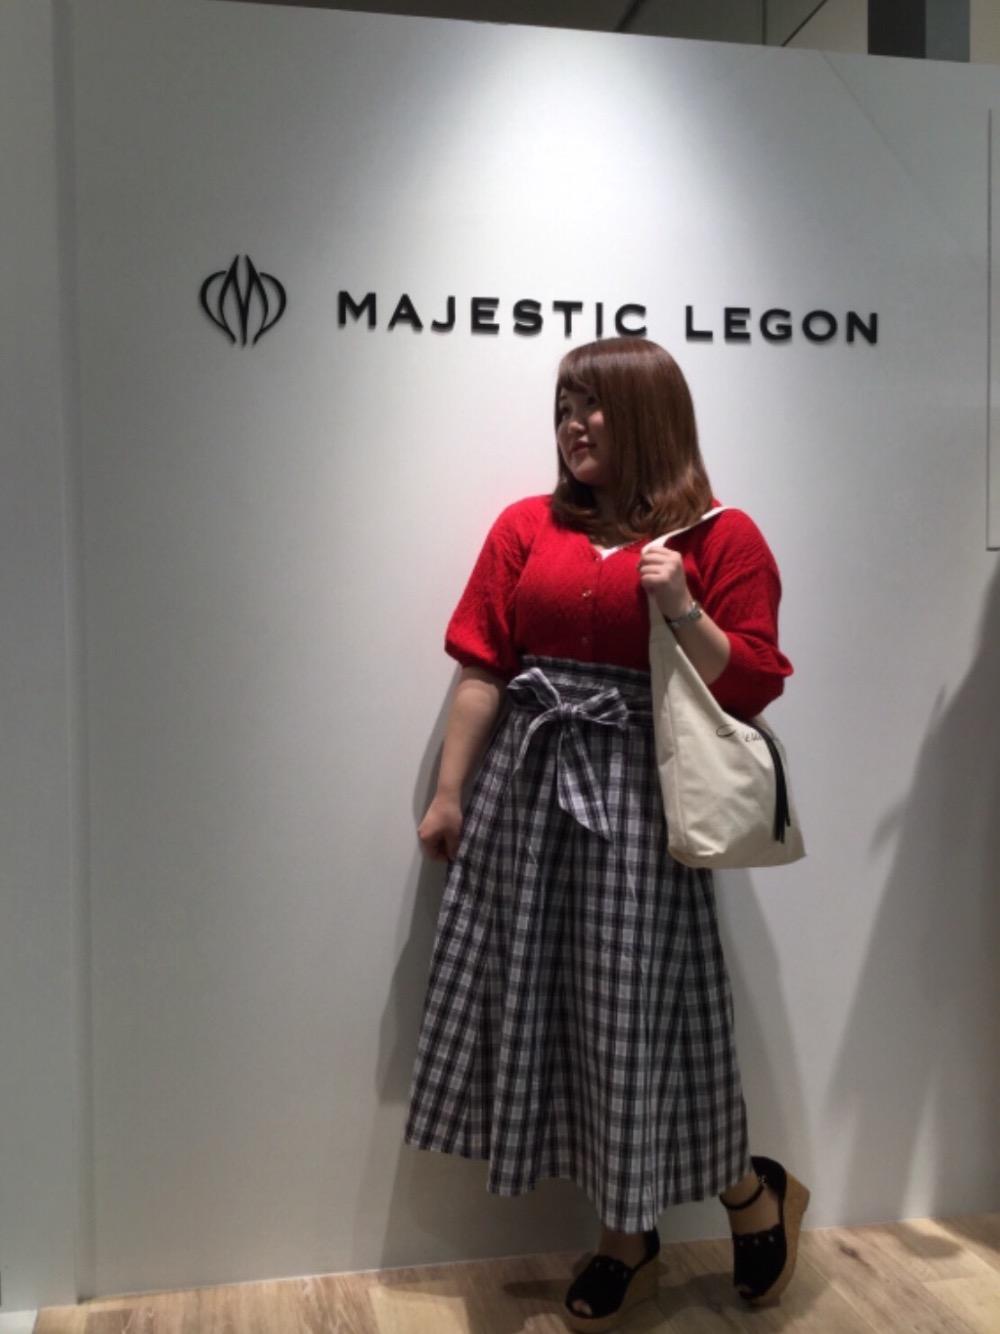 MAJESTIC LEGON秋田オーパ店